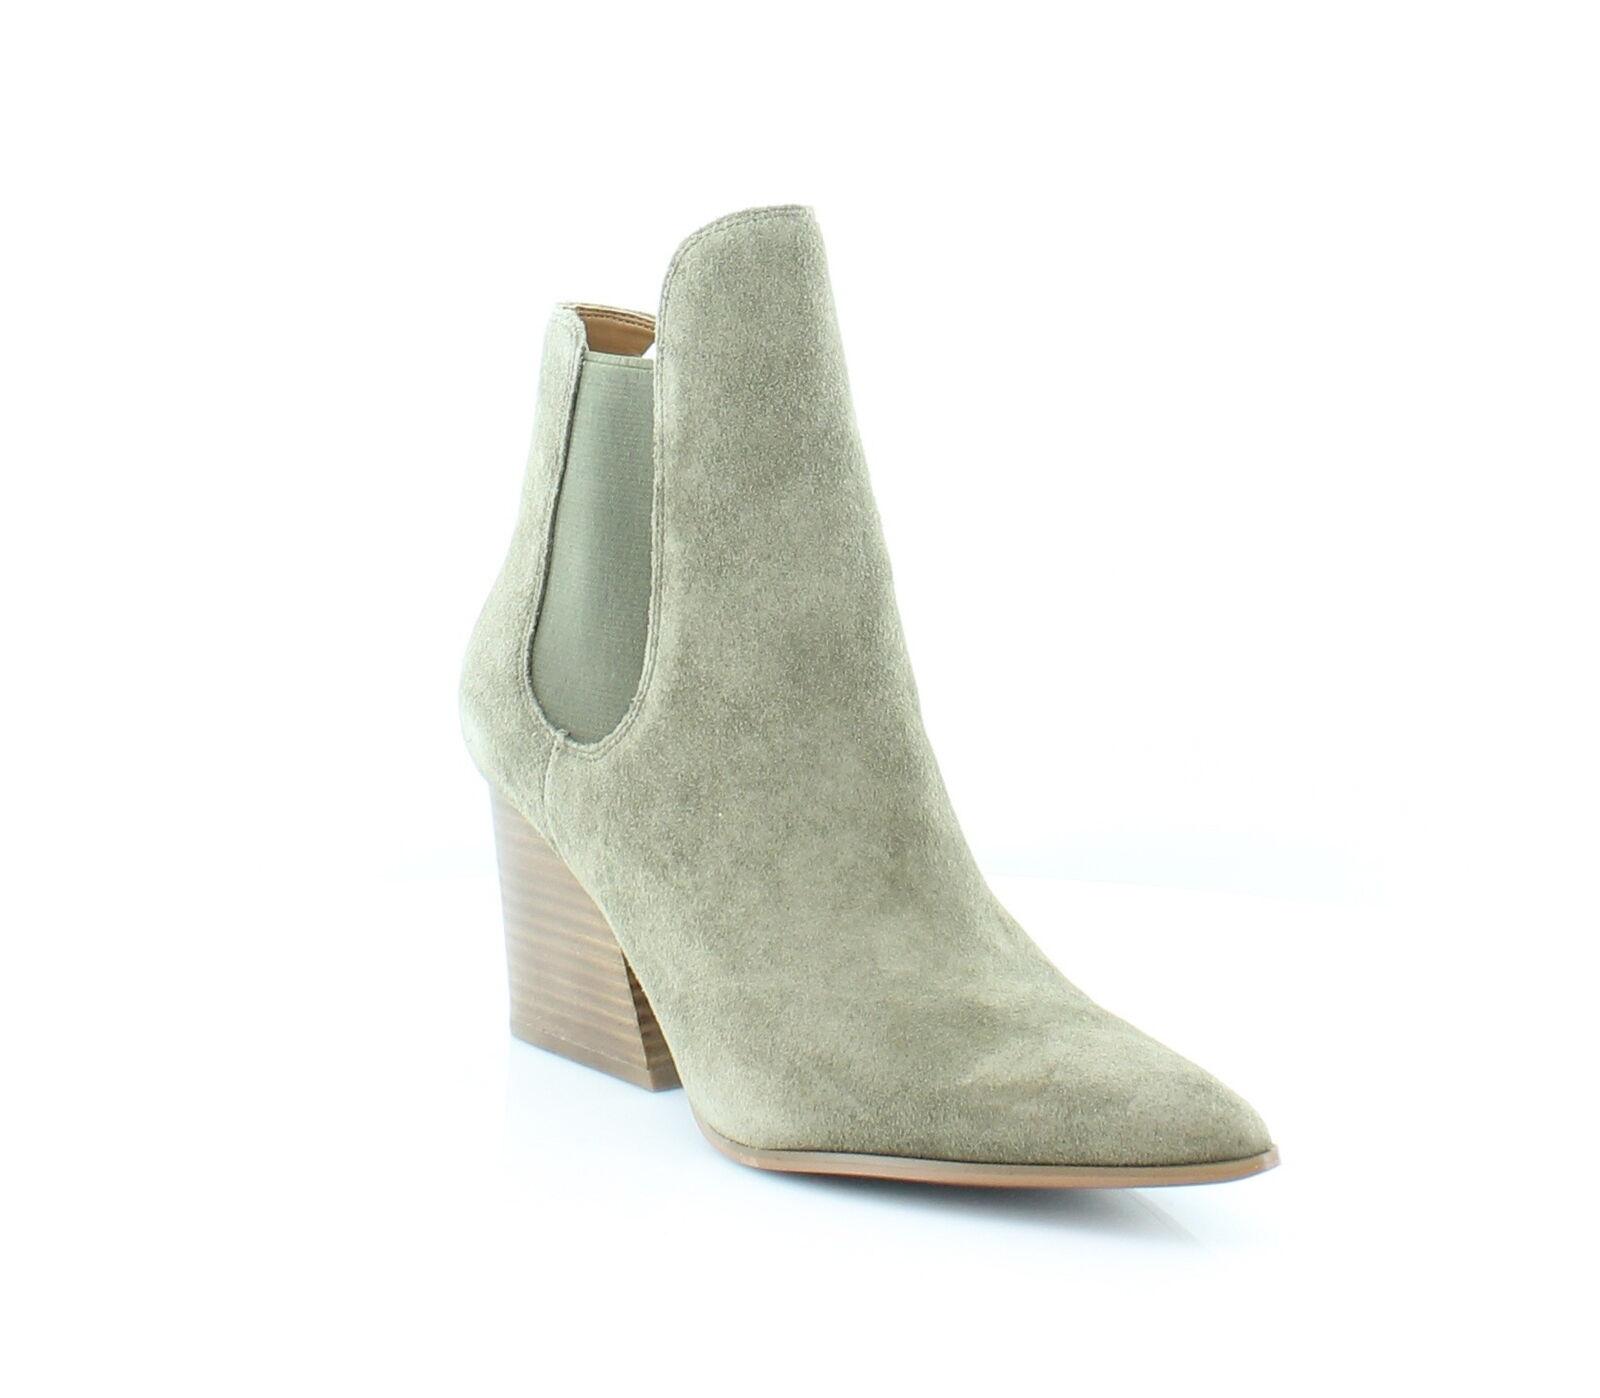 Kendall + + + Kylie Nuevo Finley verde Mujer Zapatos botas Talla 7.5 M MSRP  185 6db6ea